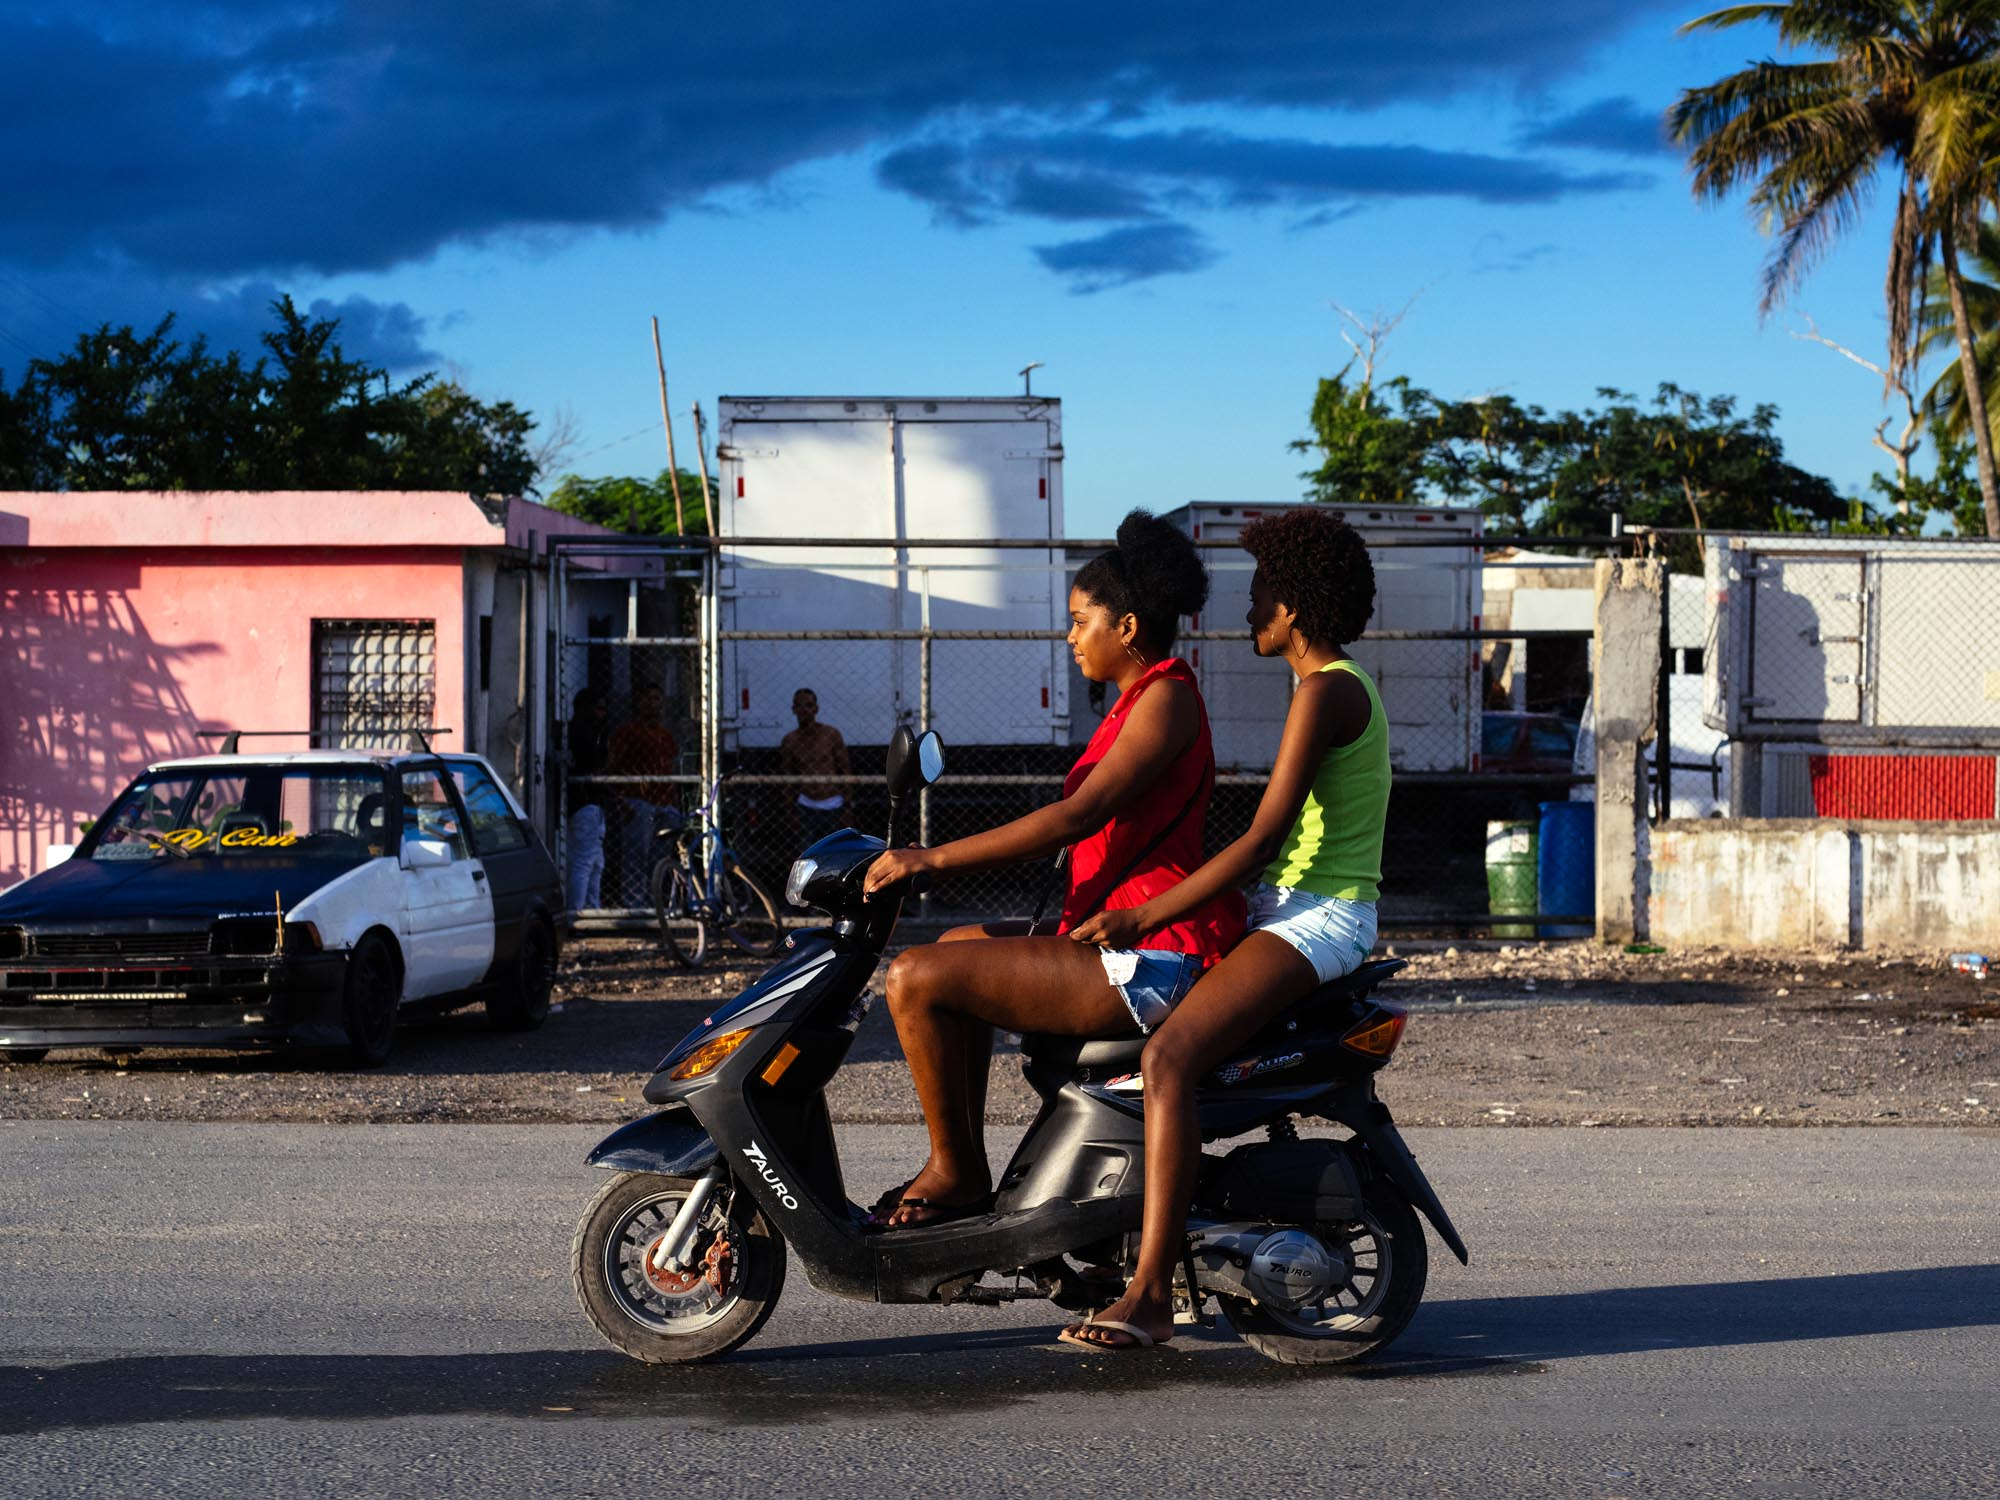 joris-hermans-photography-postcards-dominican-republic-girls.jpg